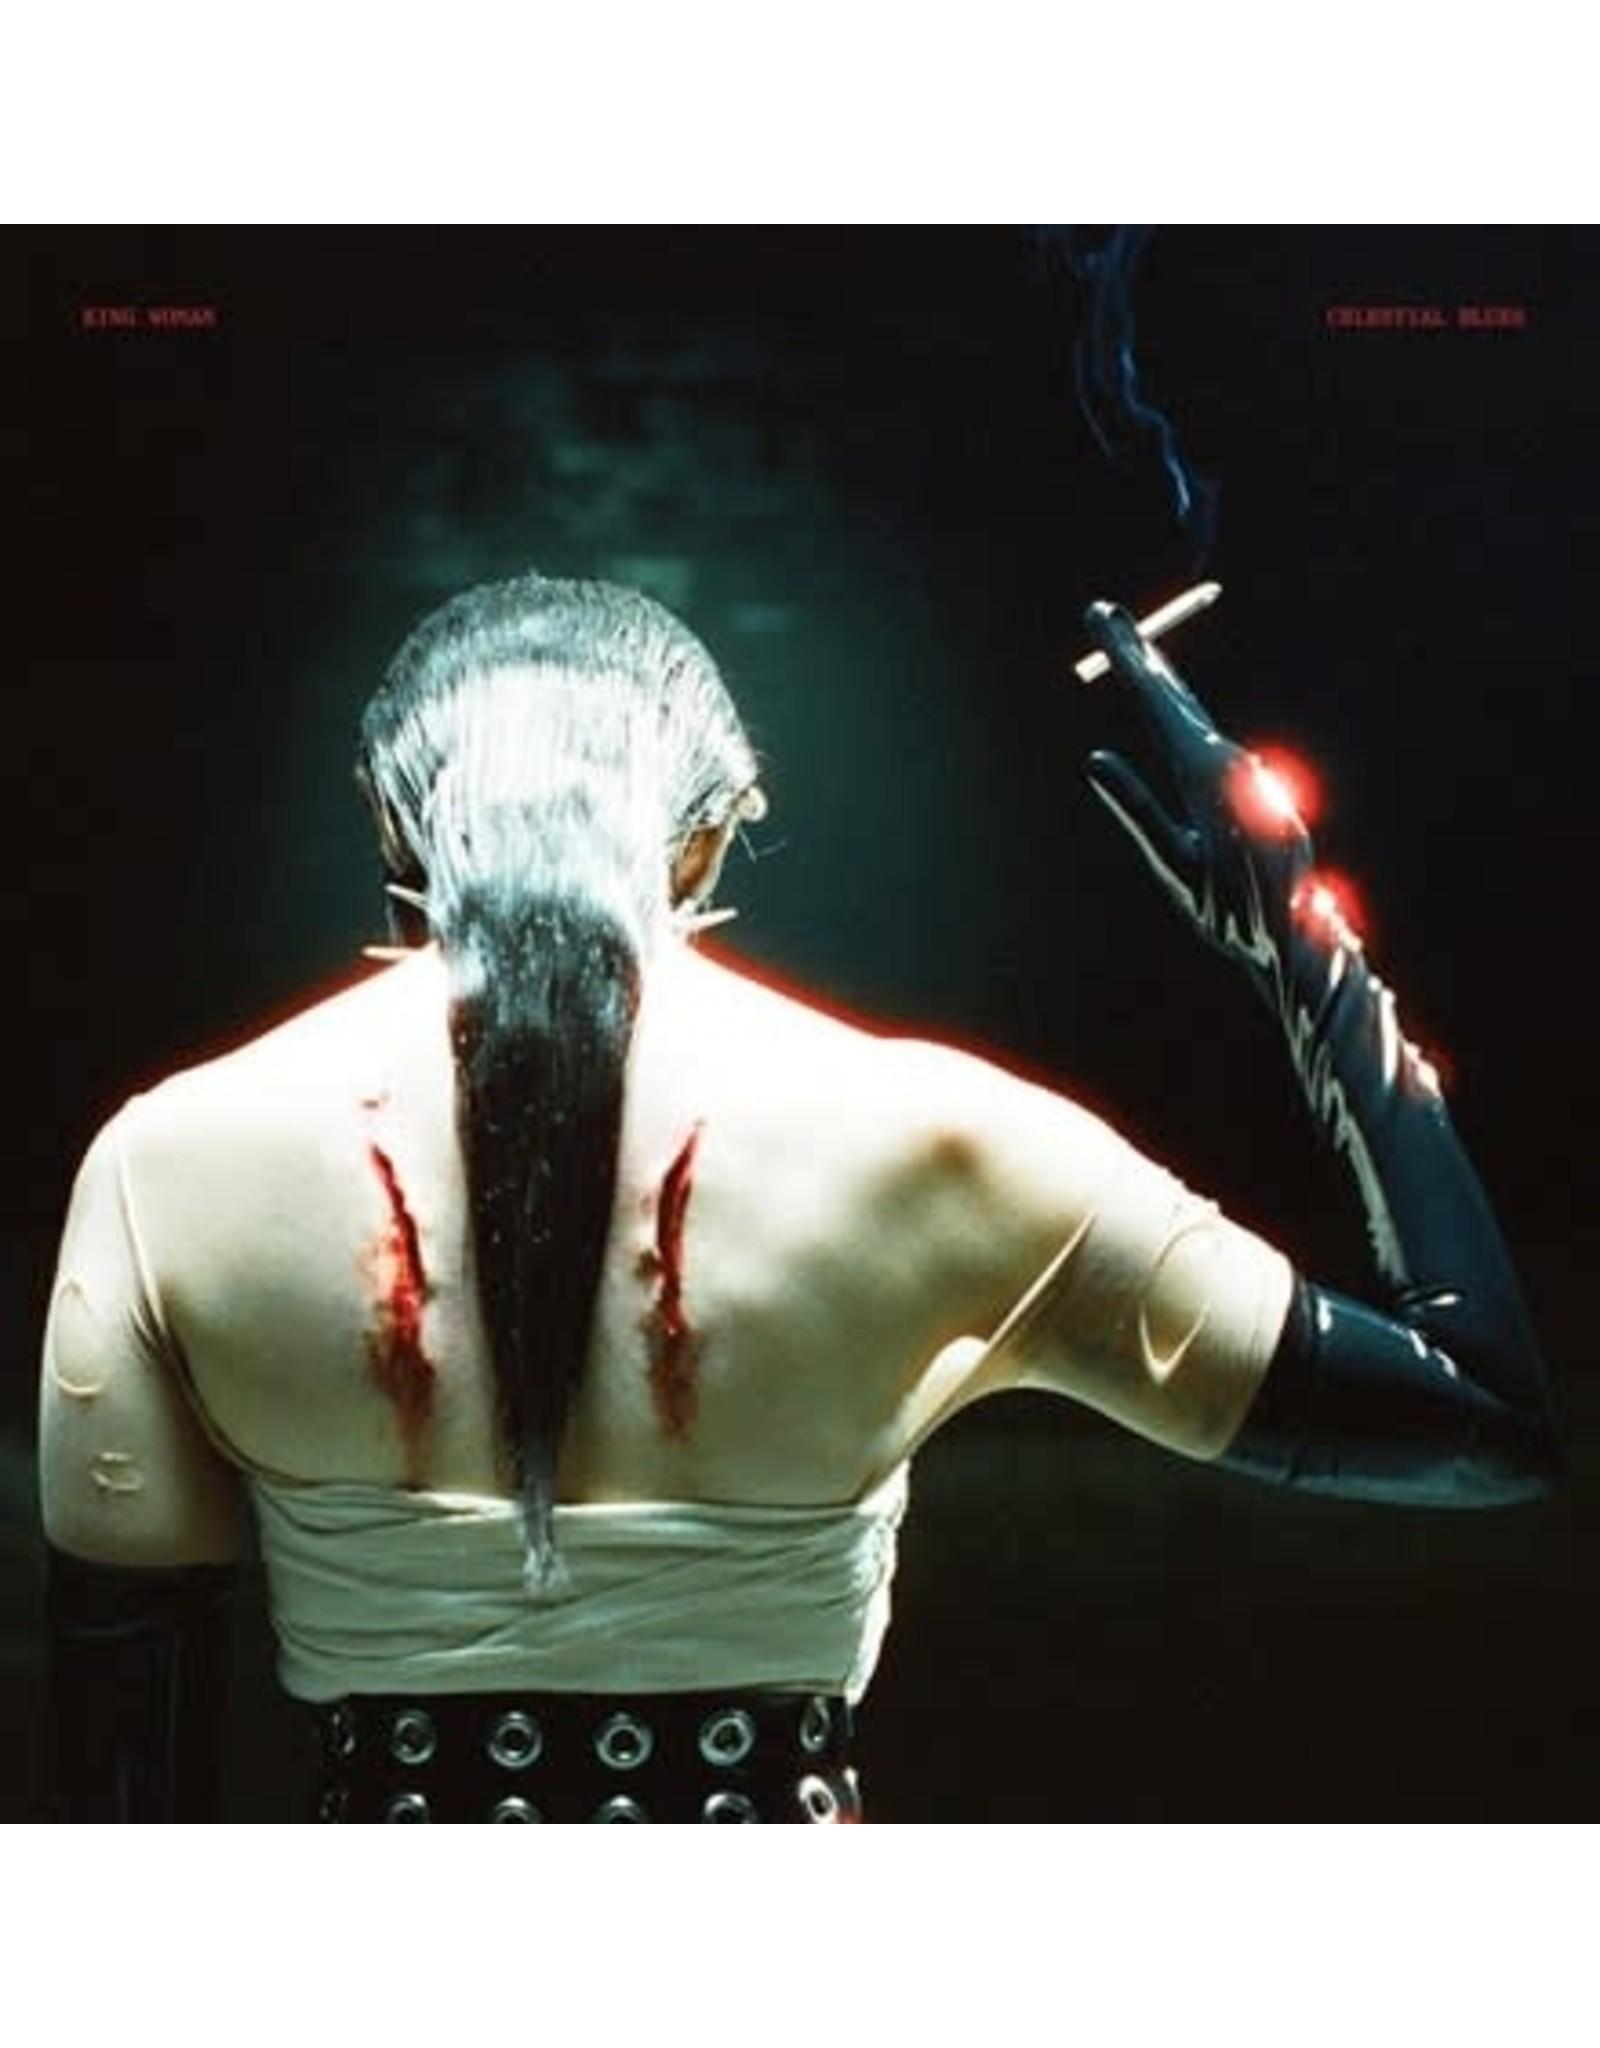 Relapse King Woman: Celestial Blues LP